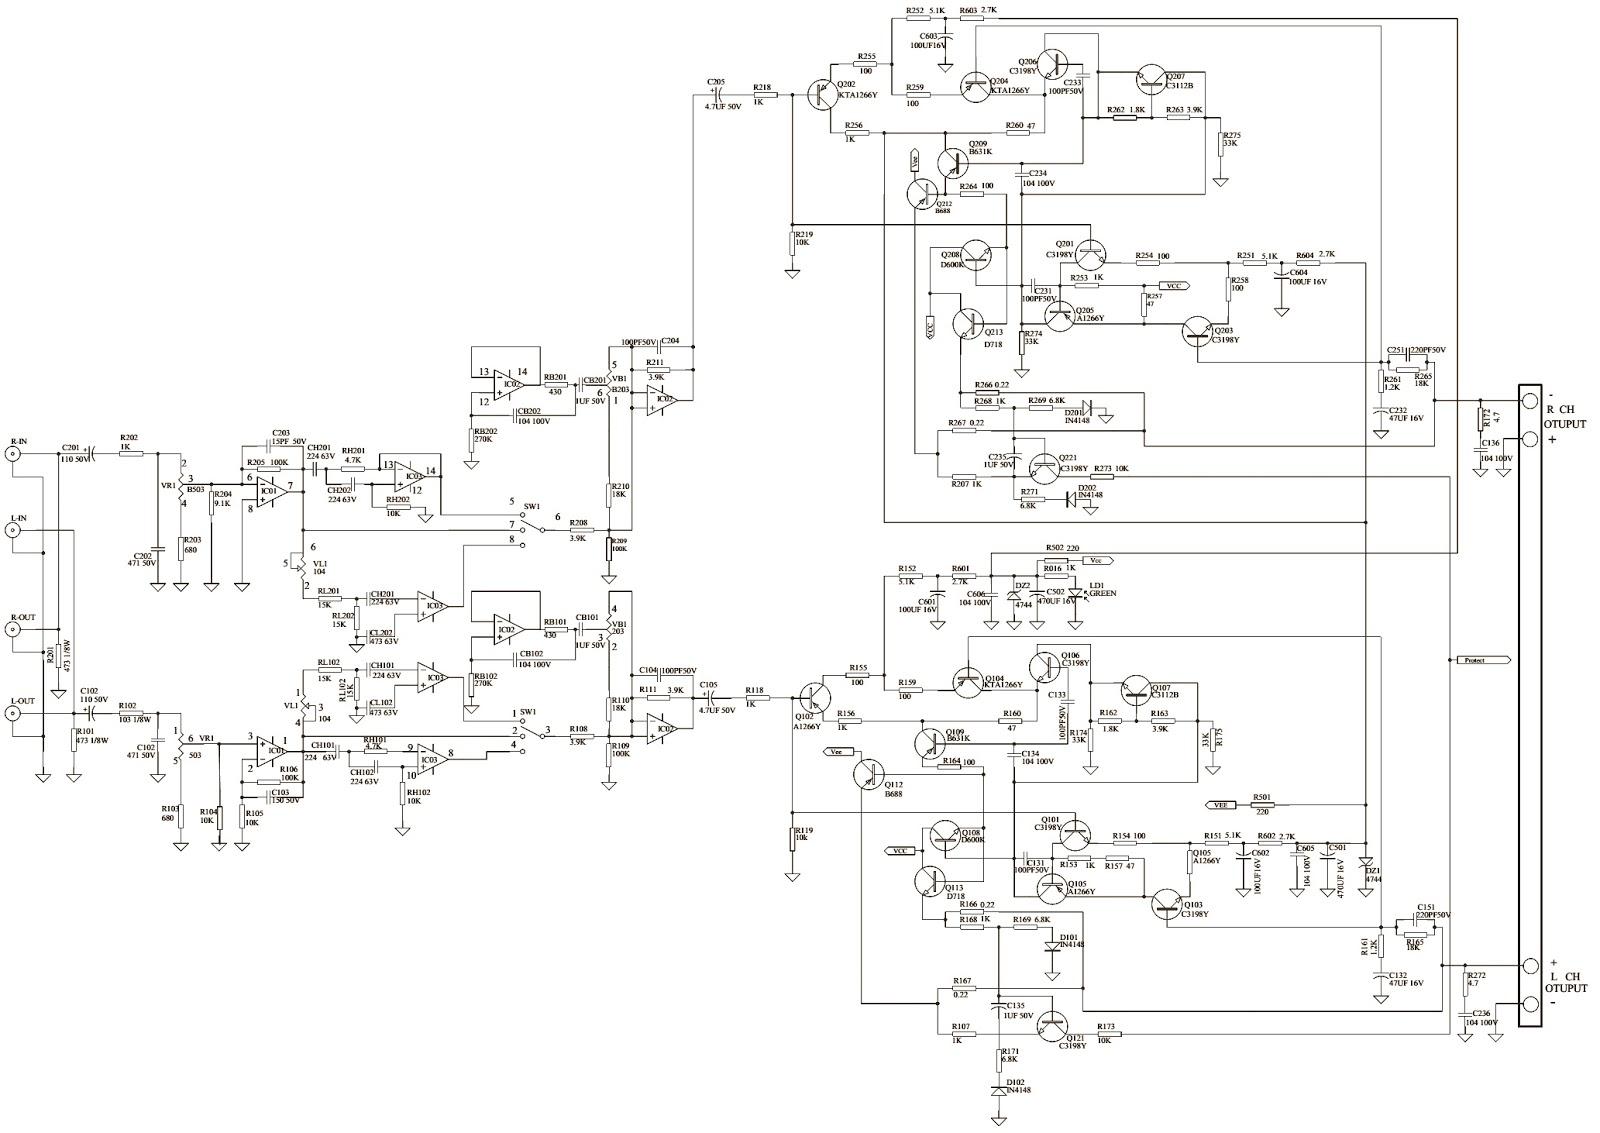 prology control1502 car audio schematic